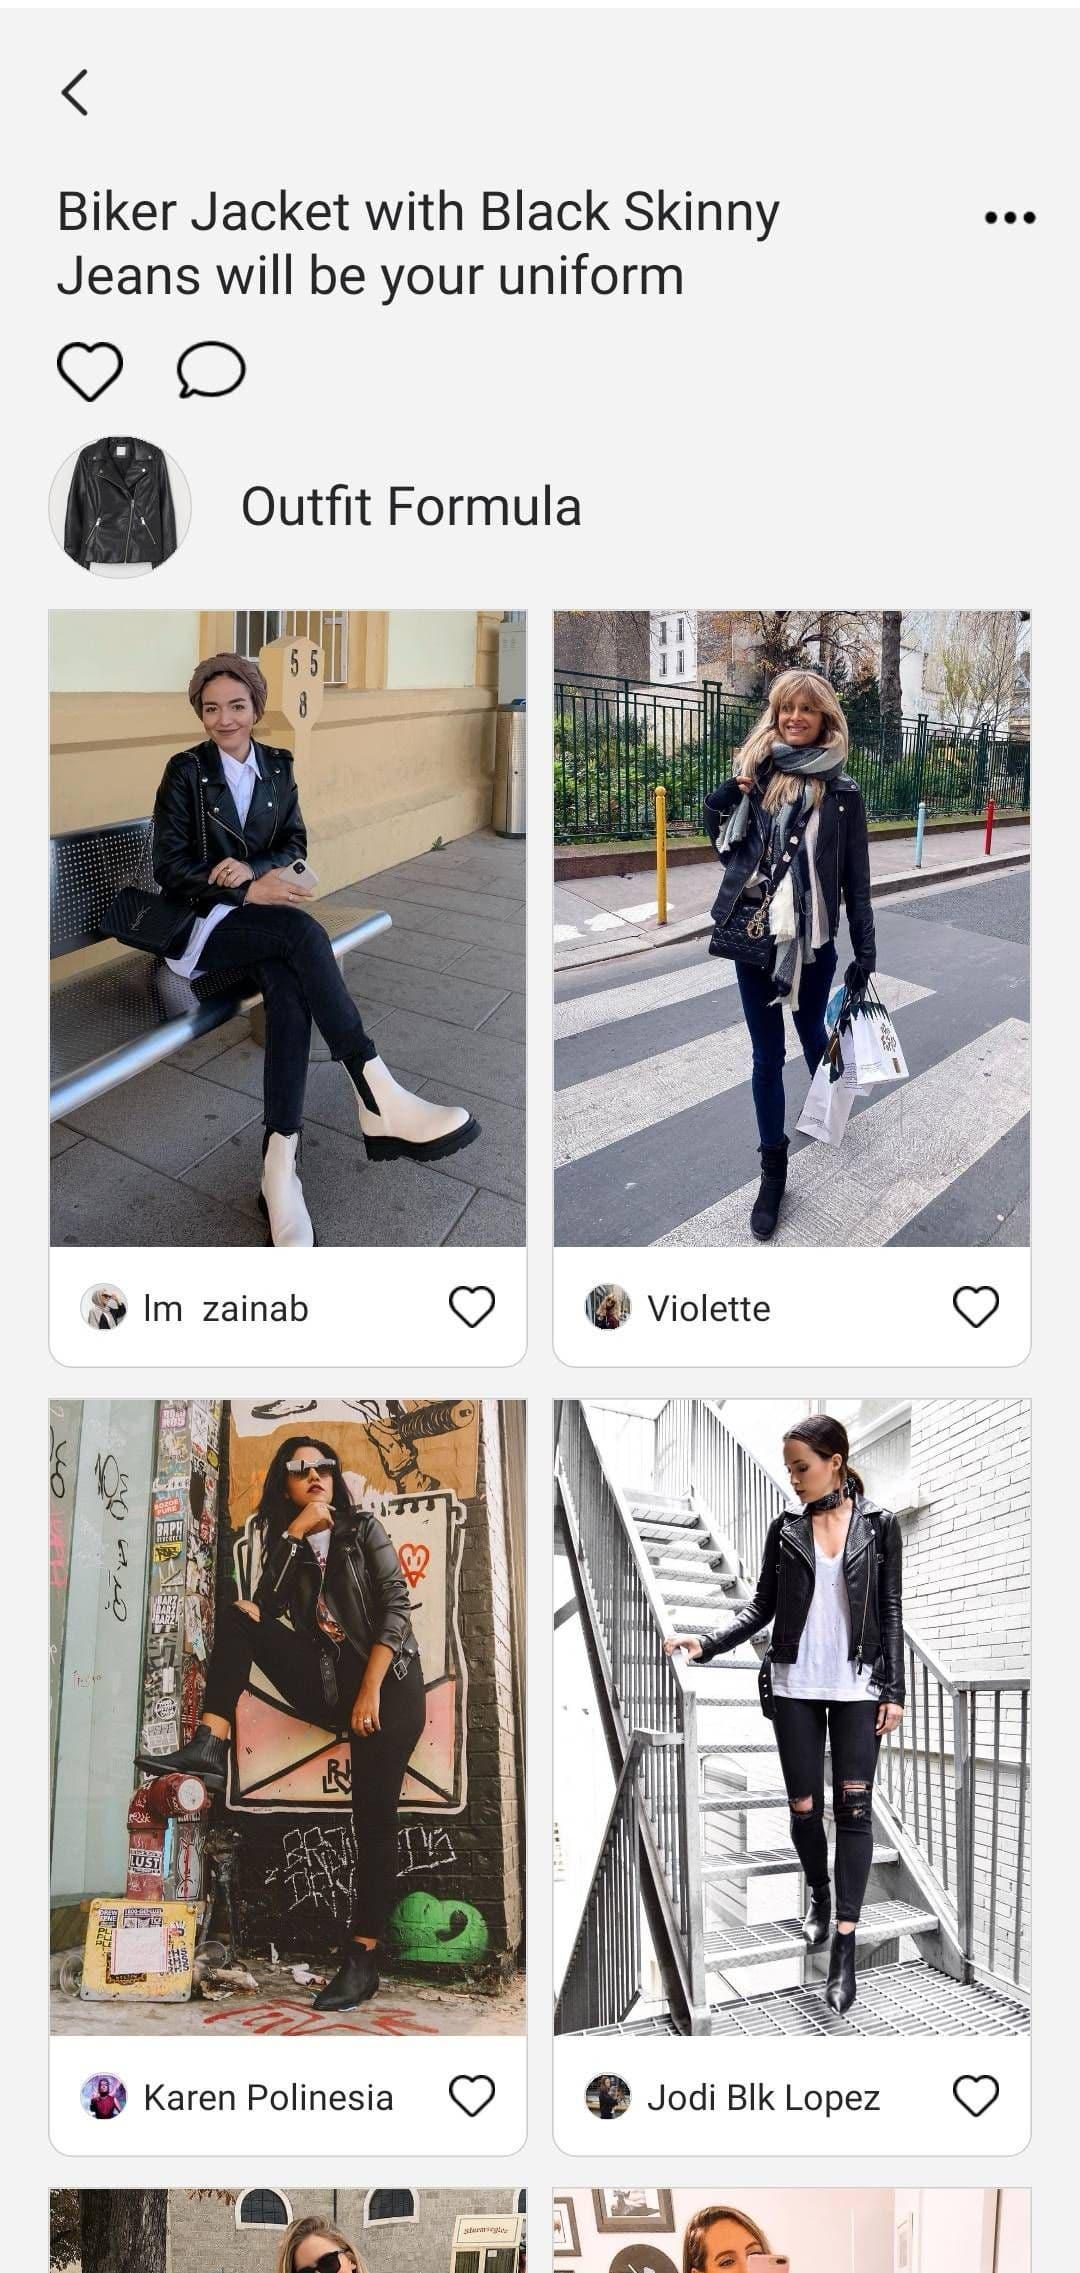 stylepedia-jacket-snapshot.png